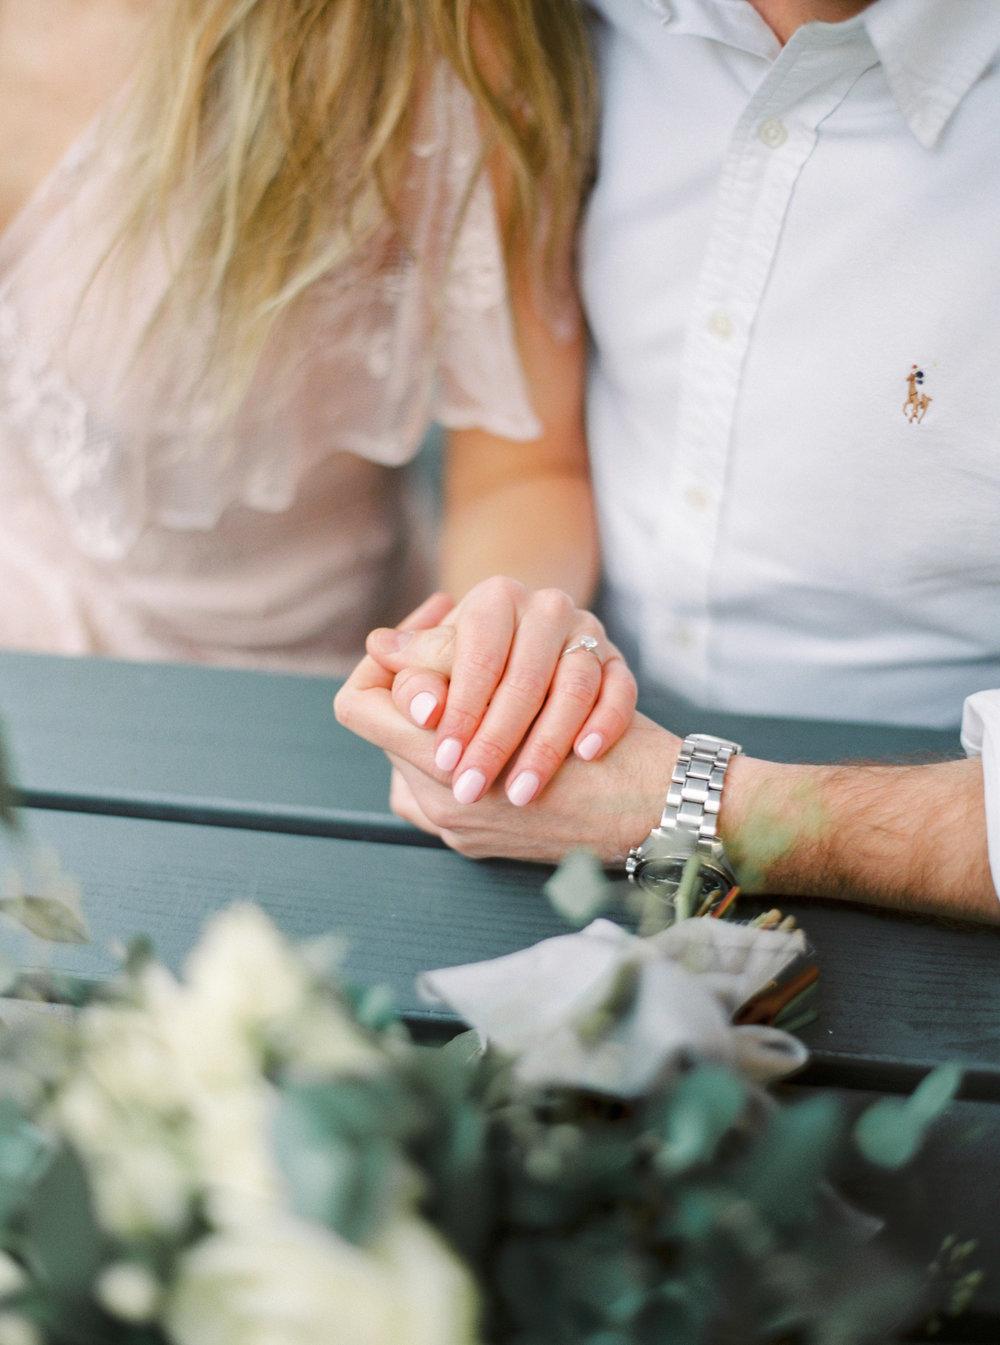 Luxury Wedding Planner UK | Our Chic & Romantic Engagement Shoot in Bath | Katie Julia Photography - 87.JPG